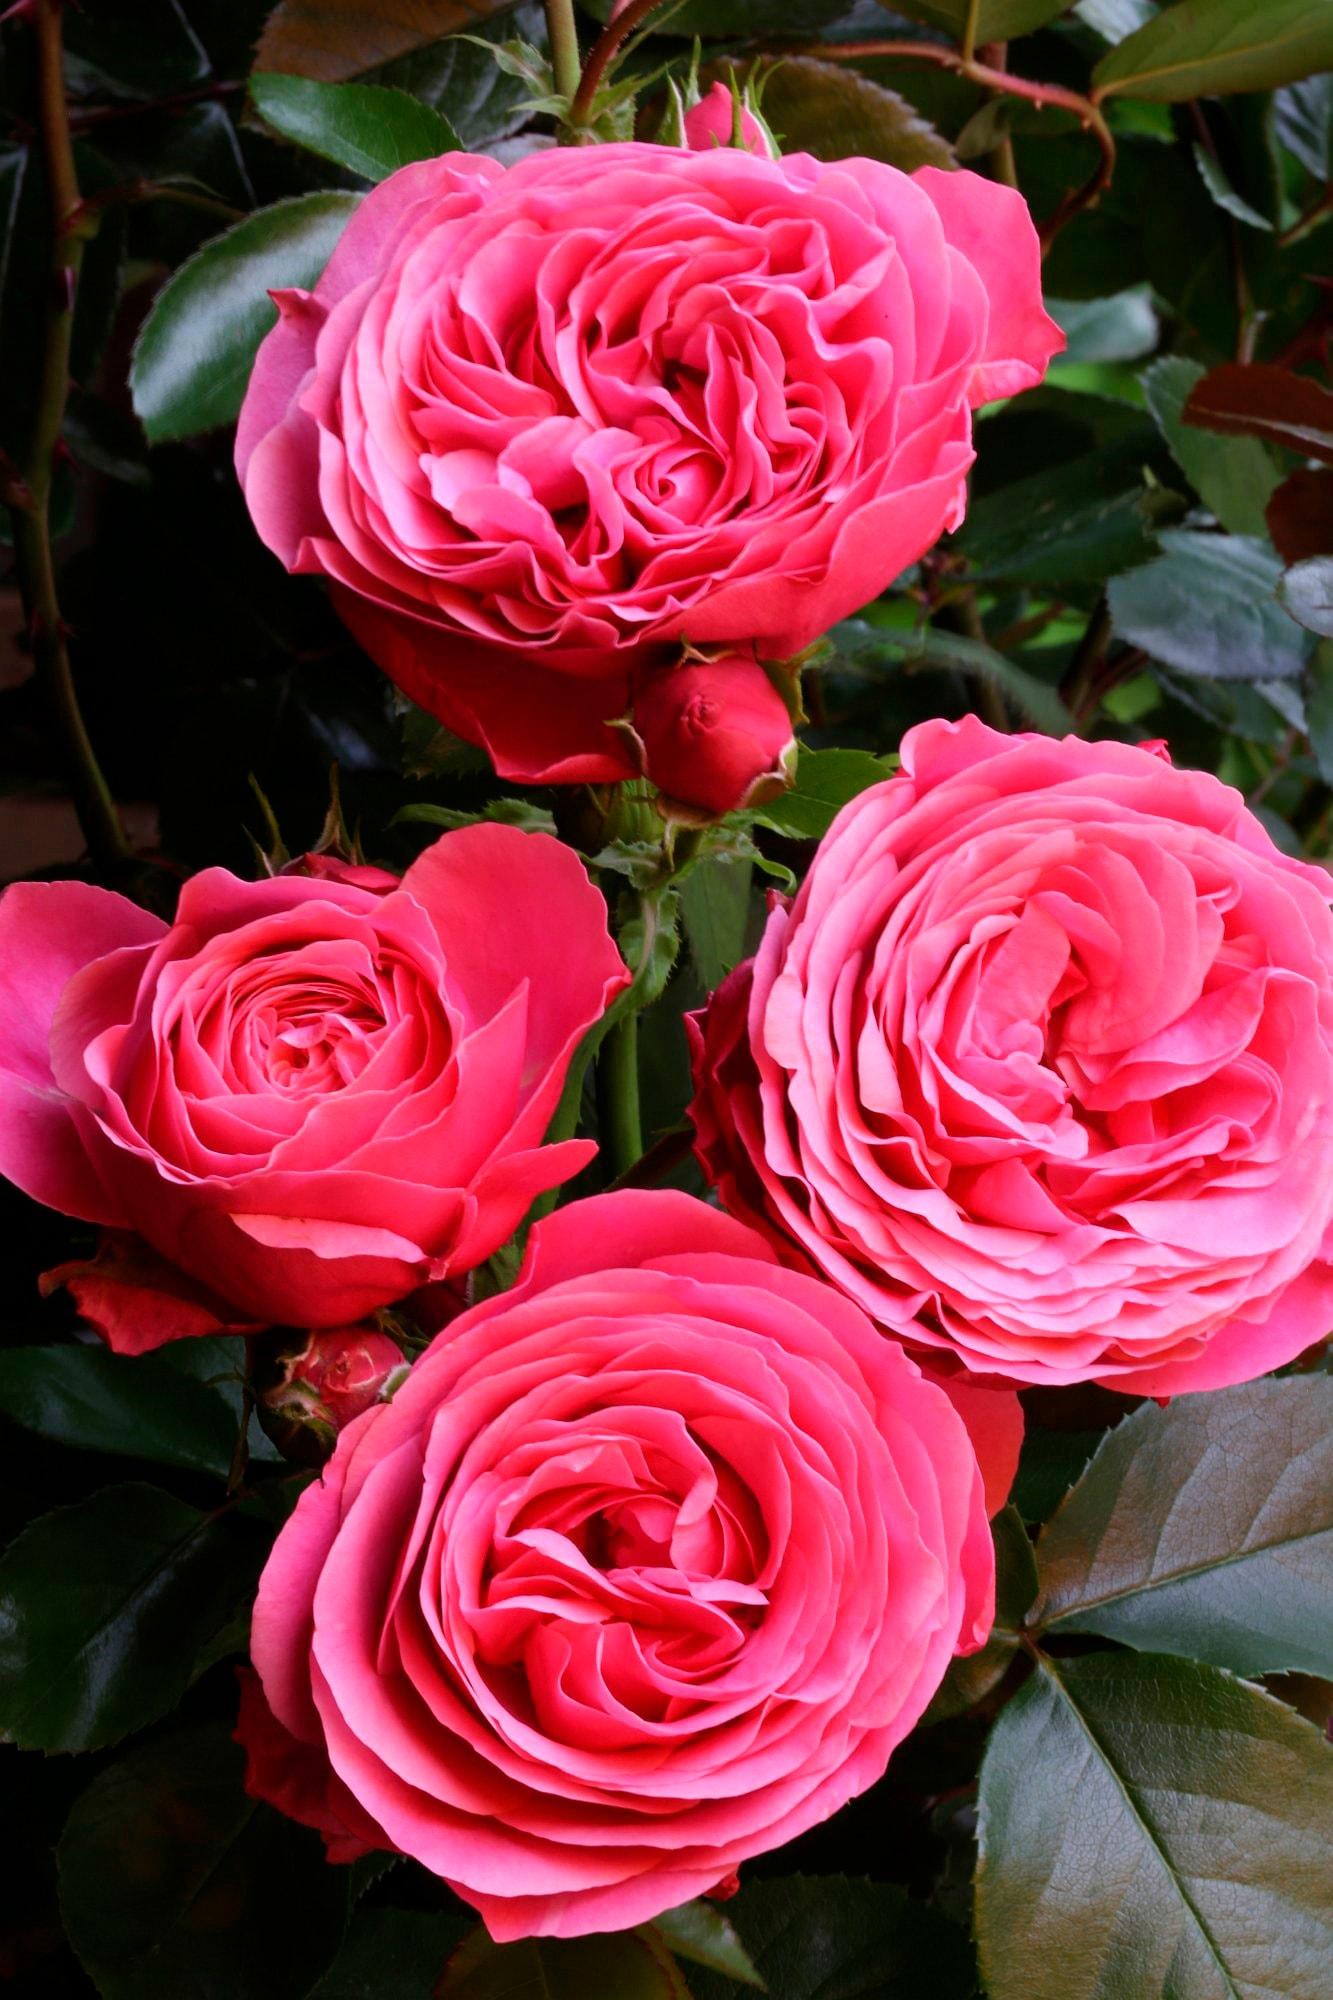 BCM Beetpflanze Rose Leonardo da Vinci rosa Beetpflanzen Pflanzen Garten Balkon